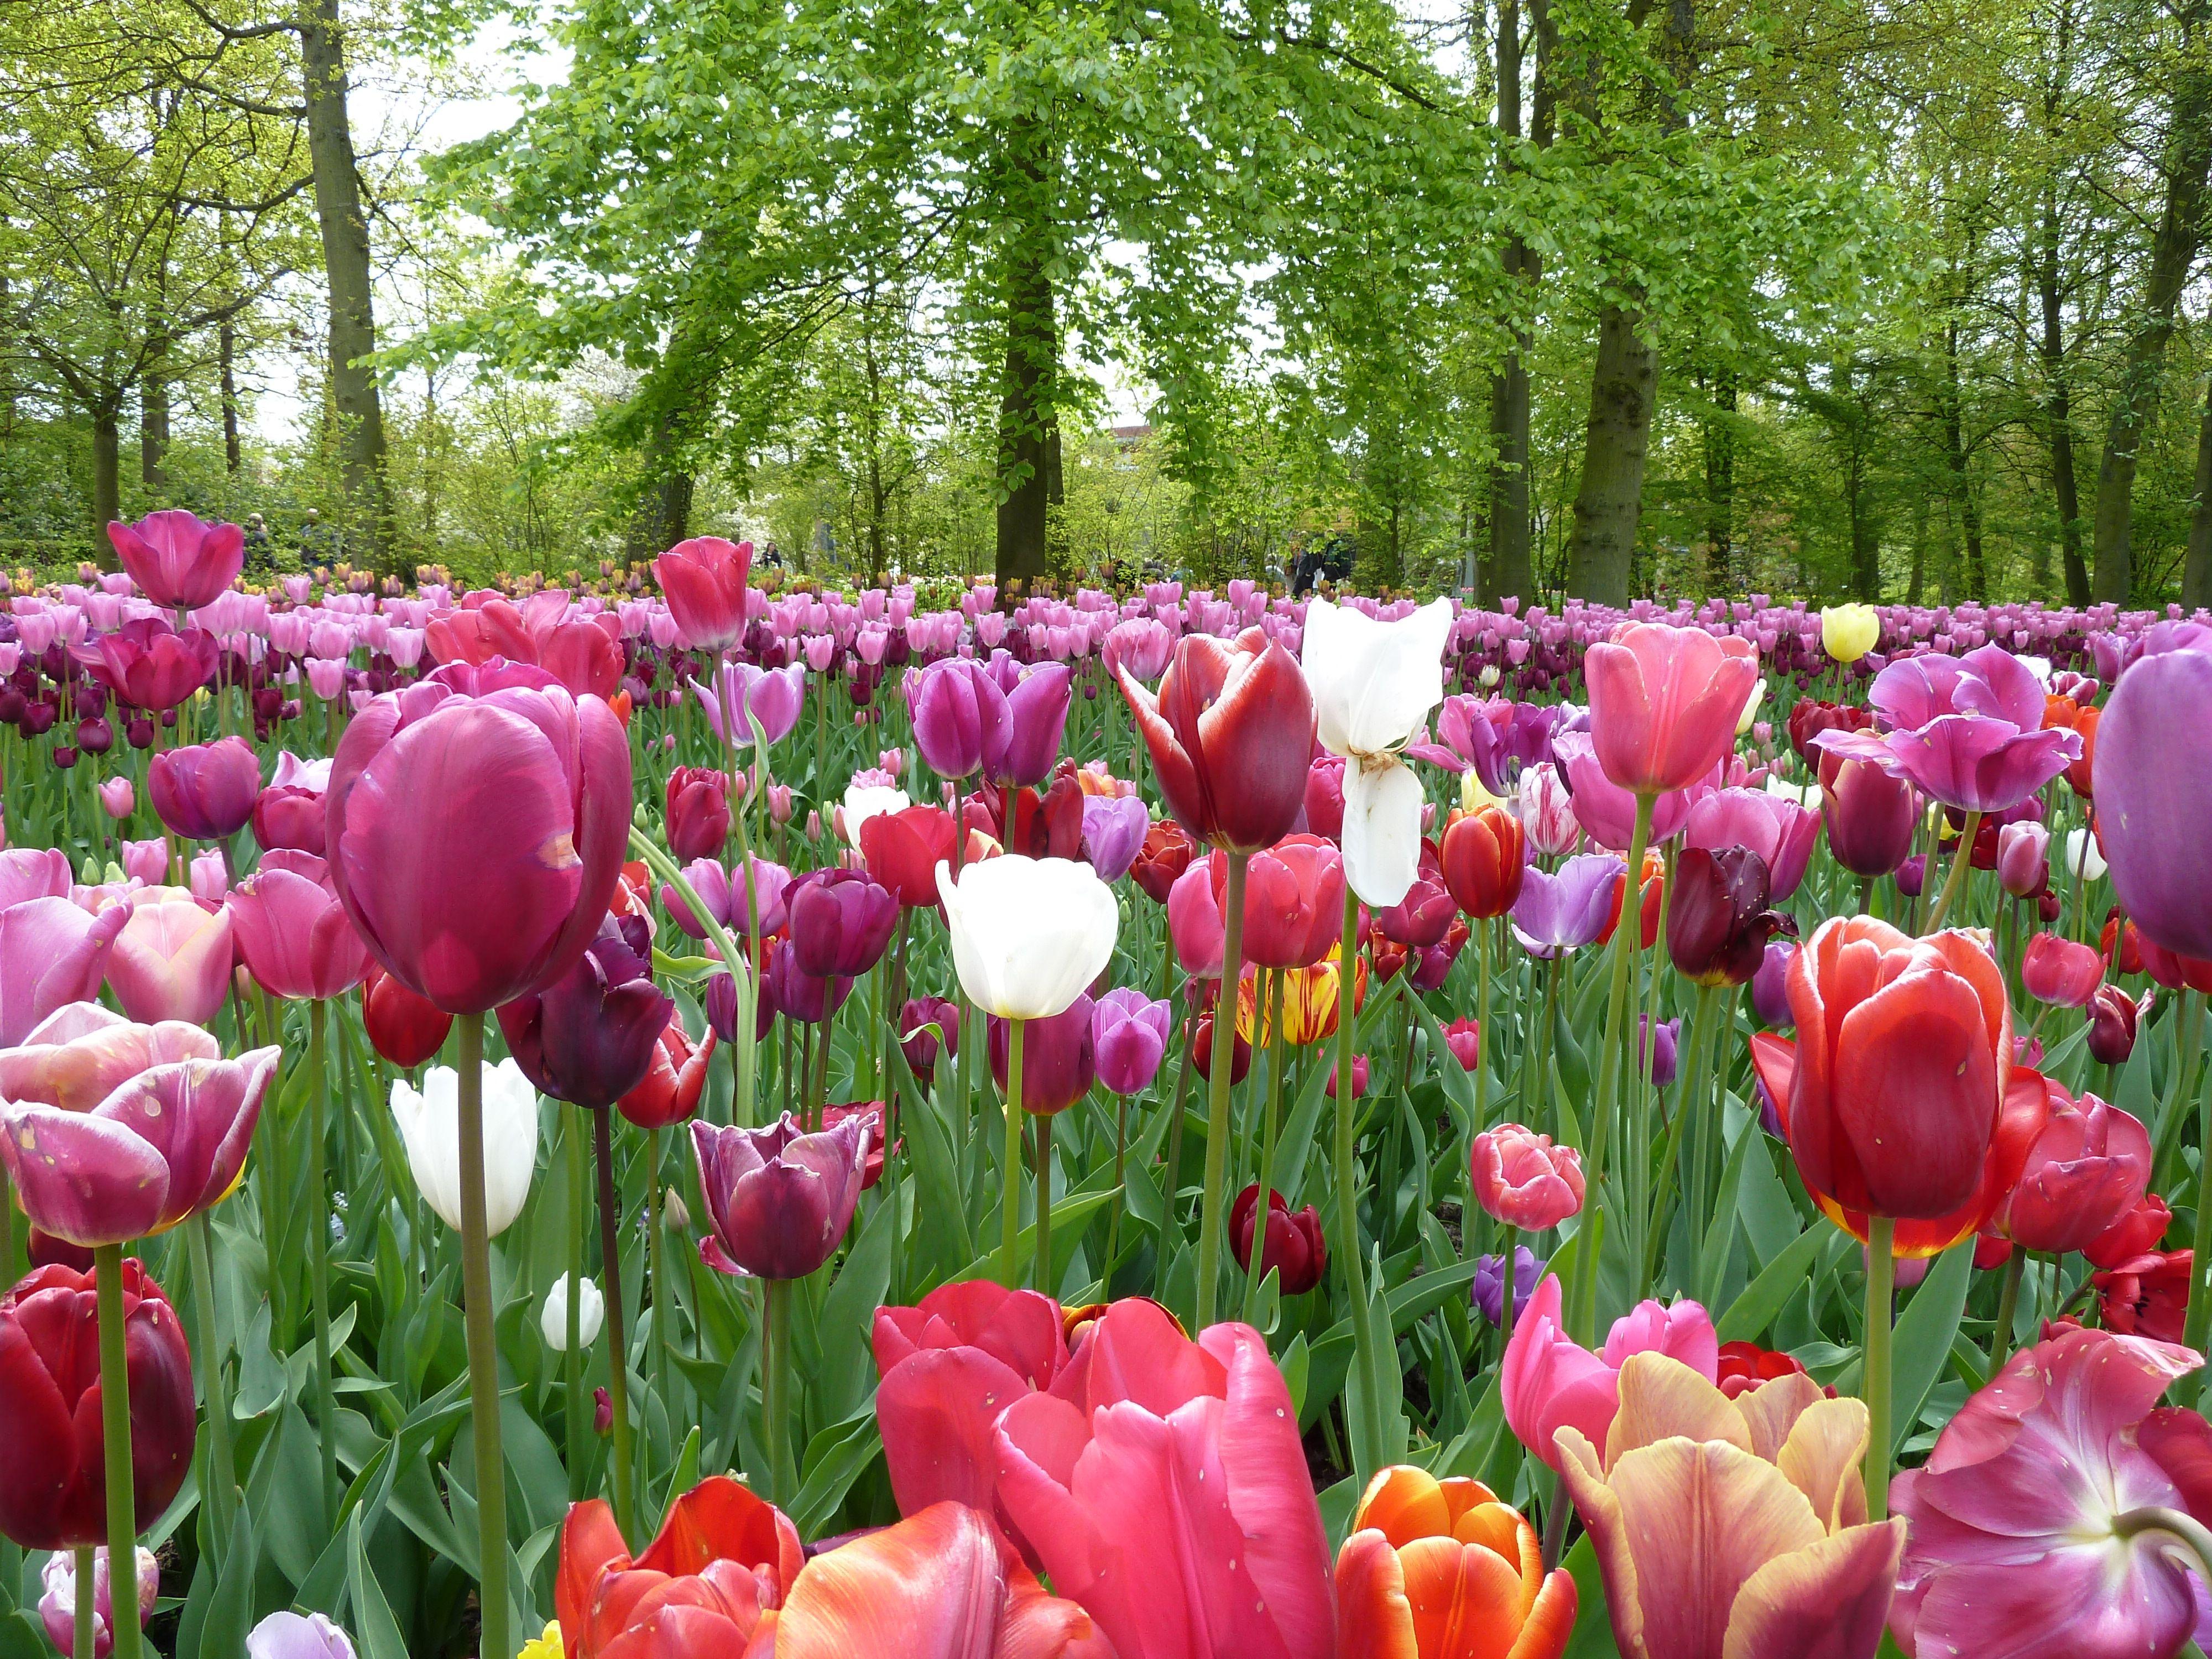 Pemandangan Taman Bunga Sakura Yang Indah Image By Pelautscom Flower Tulip Pinterest